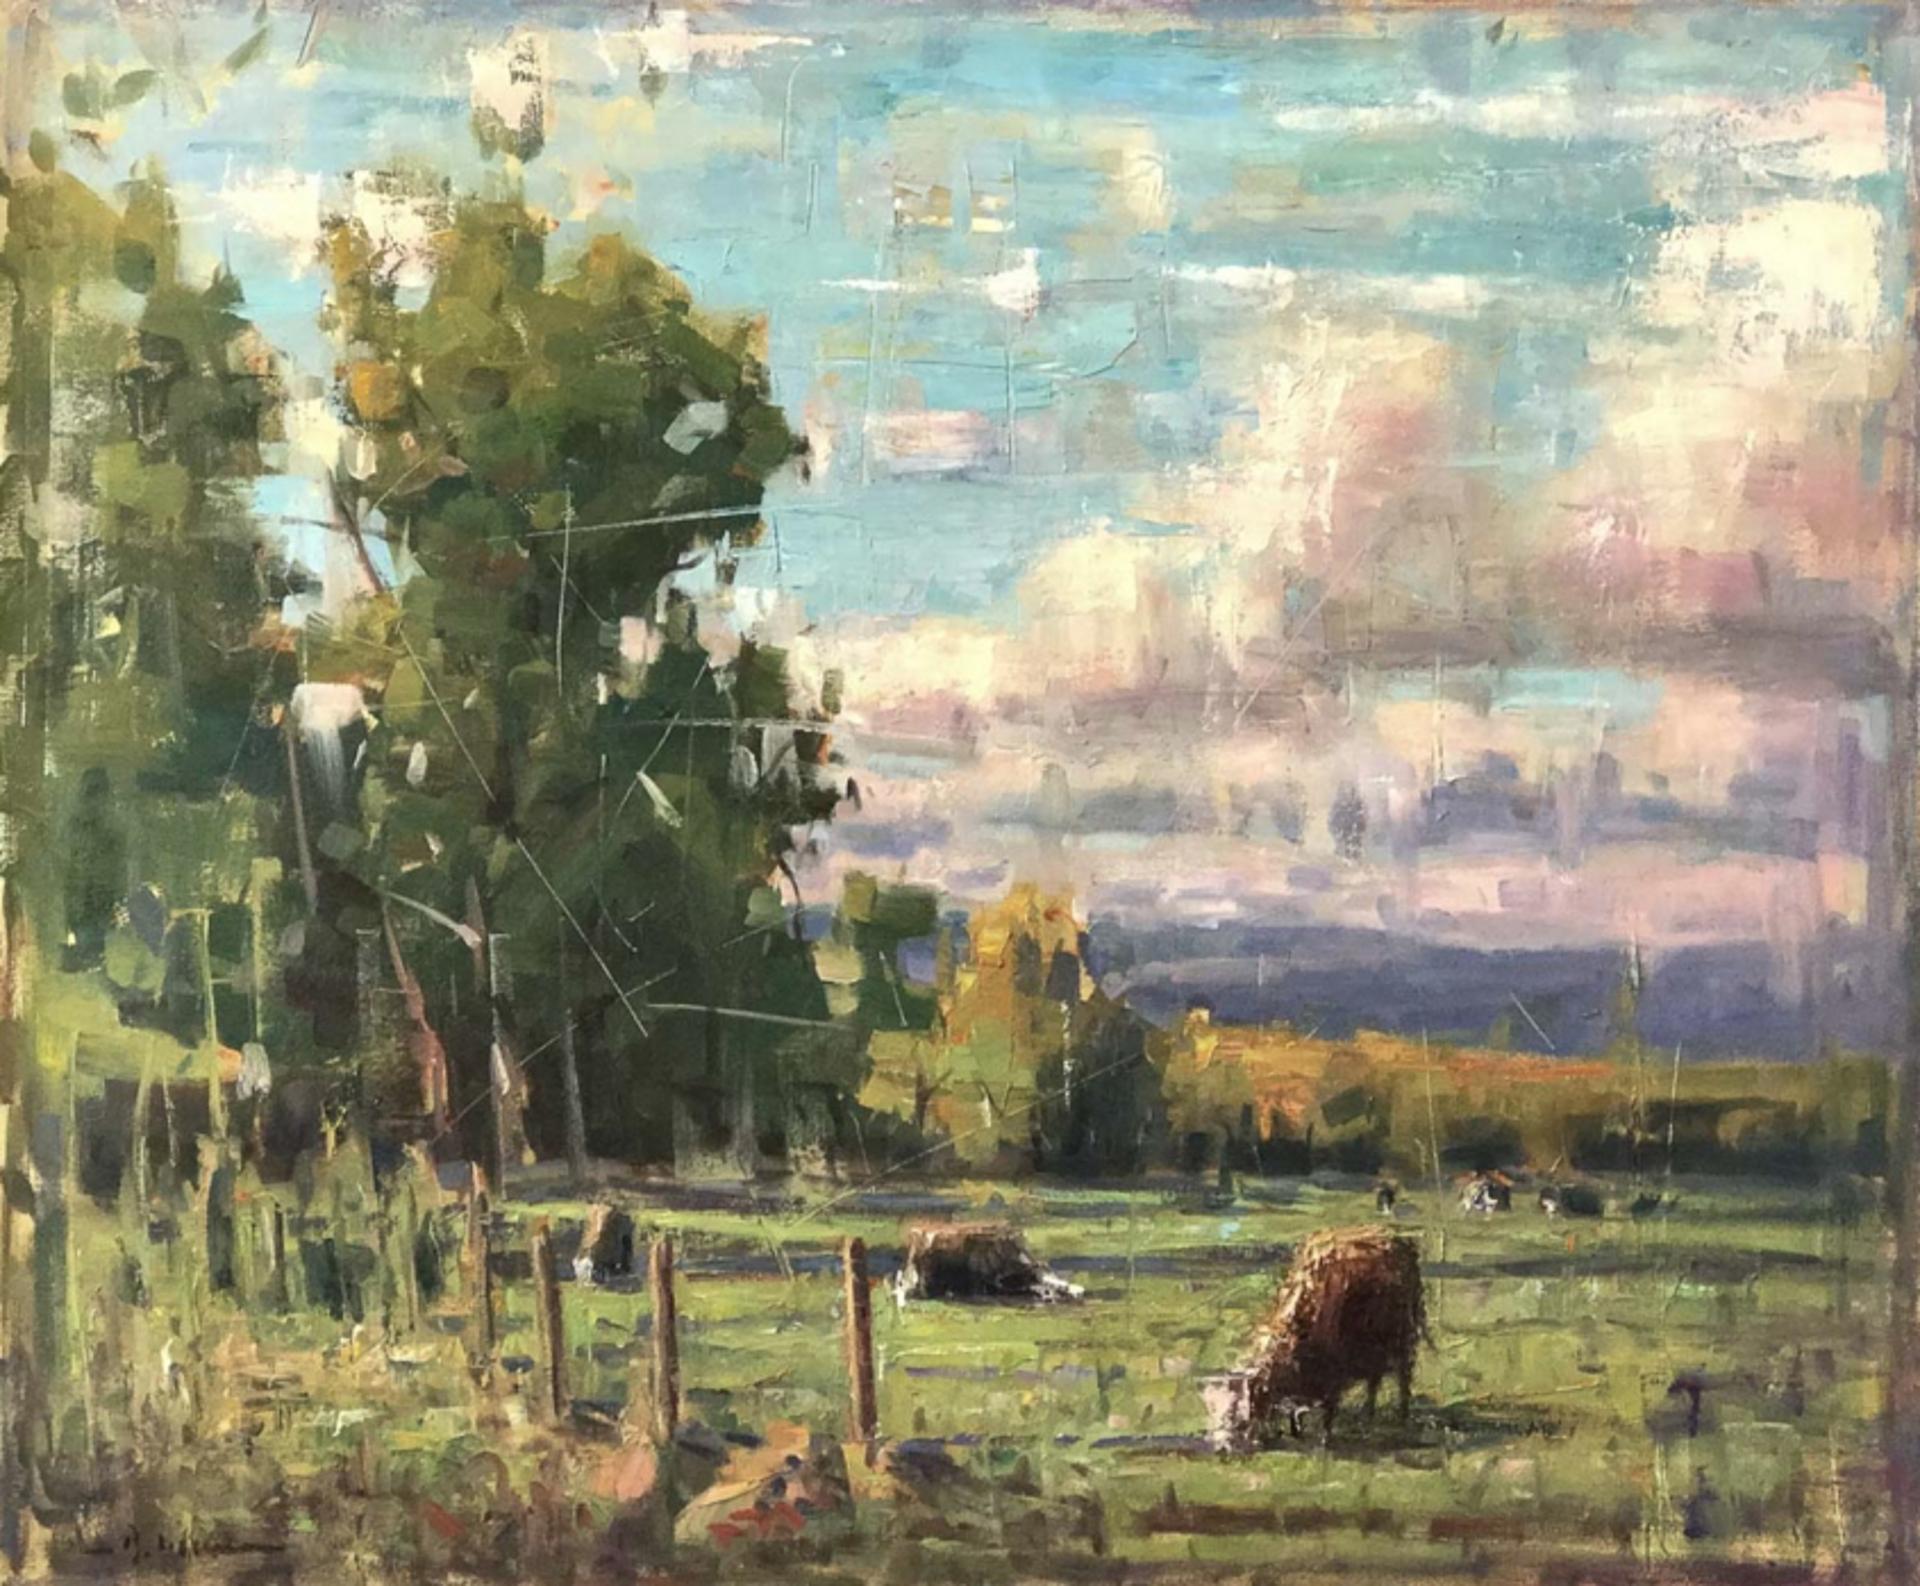 Through Pastures Green by Brett Weaver